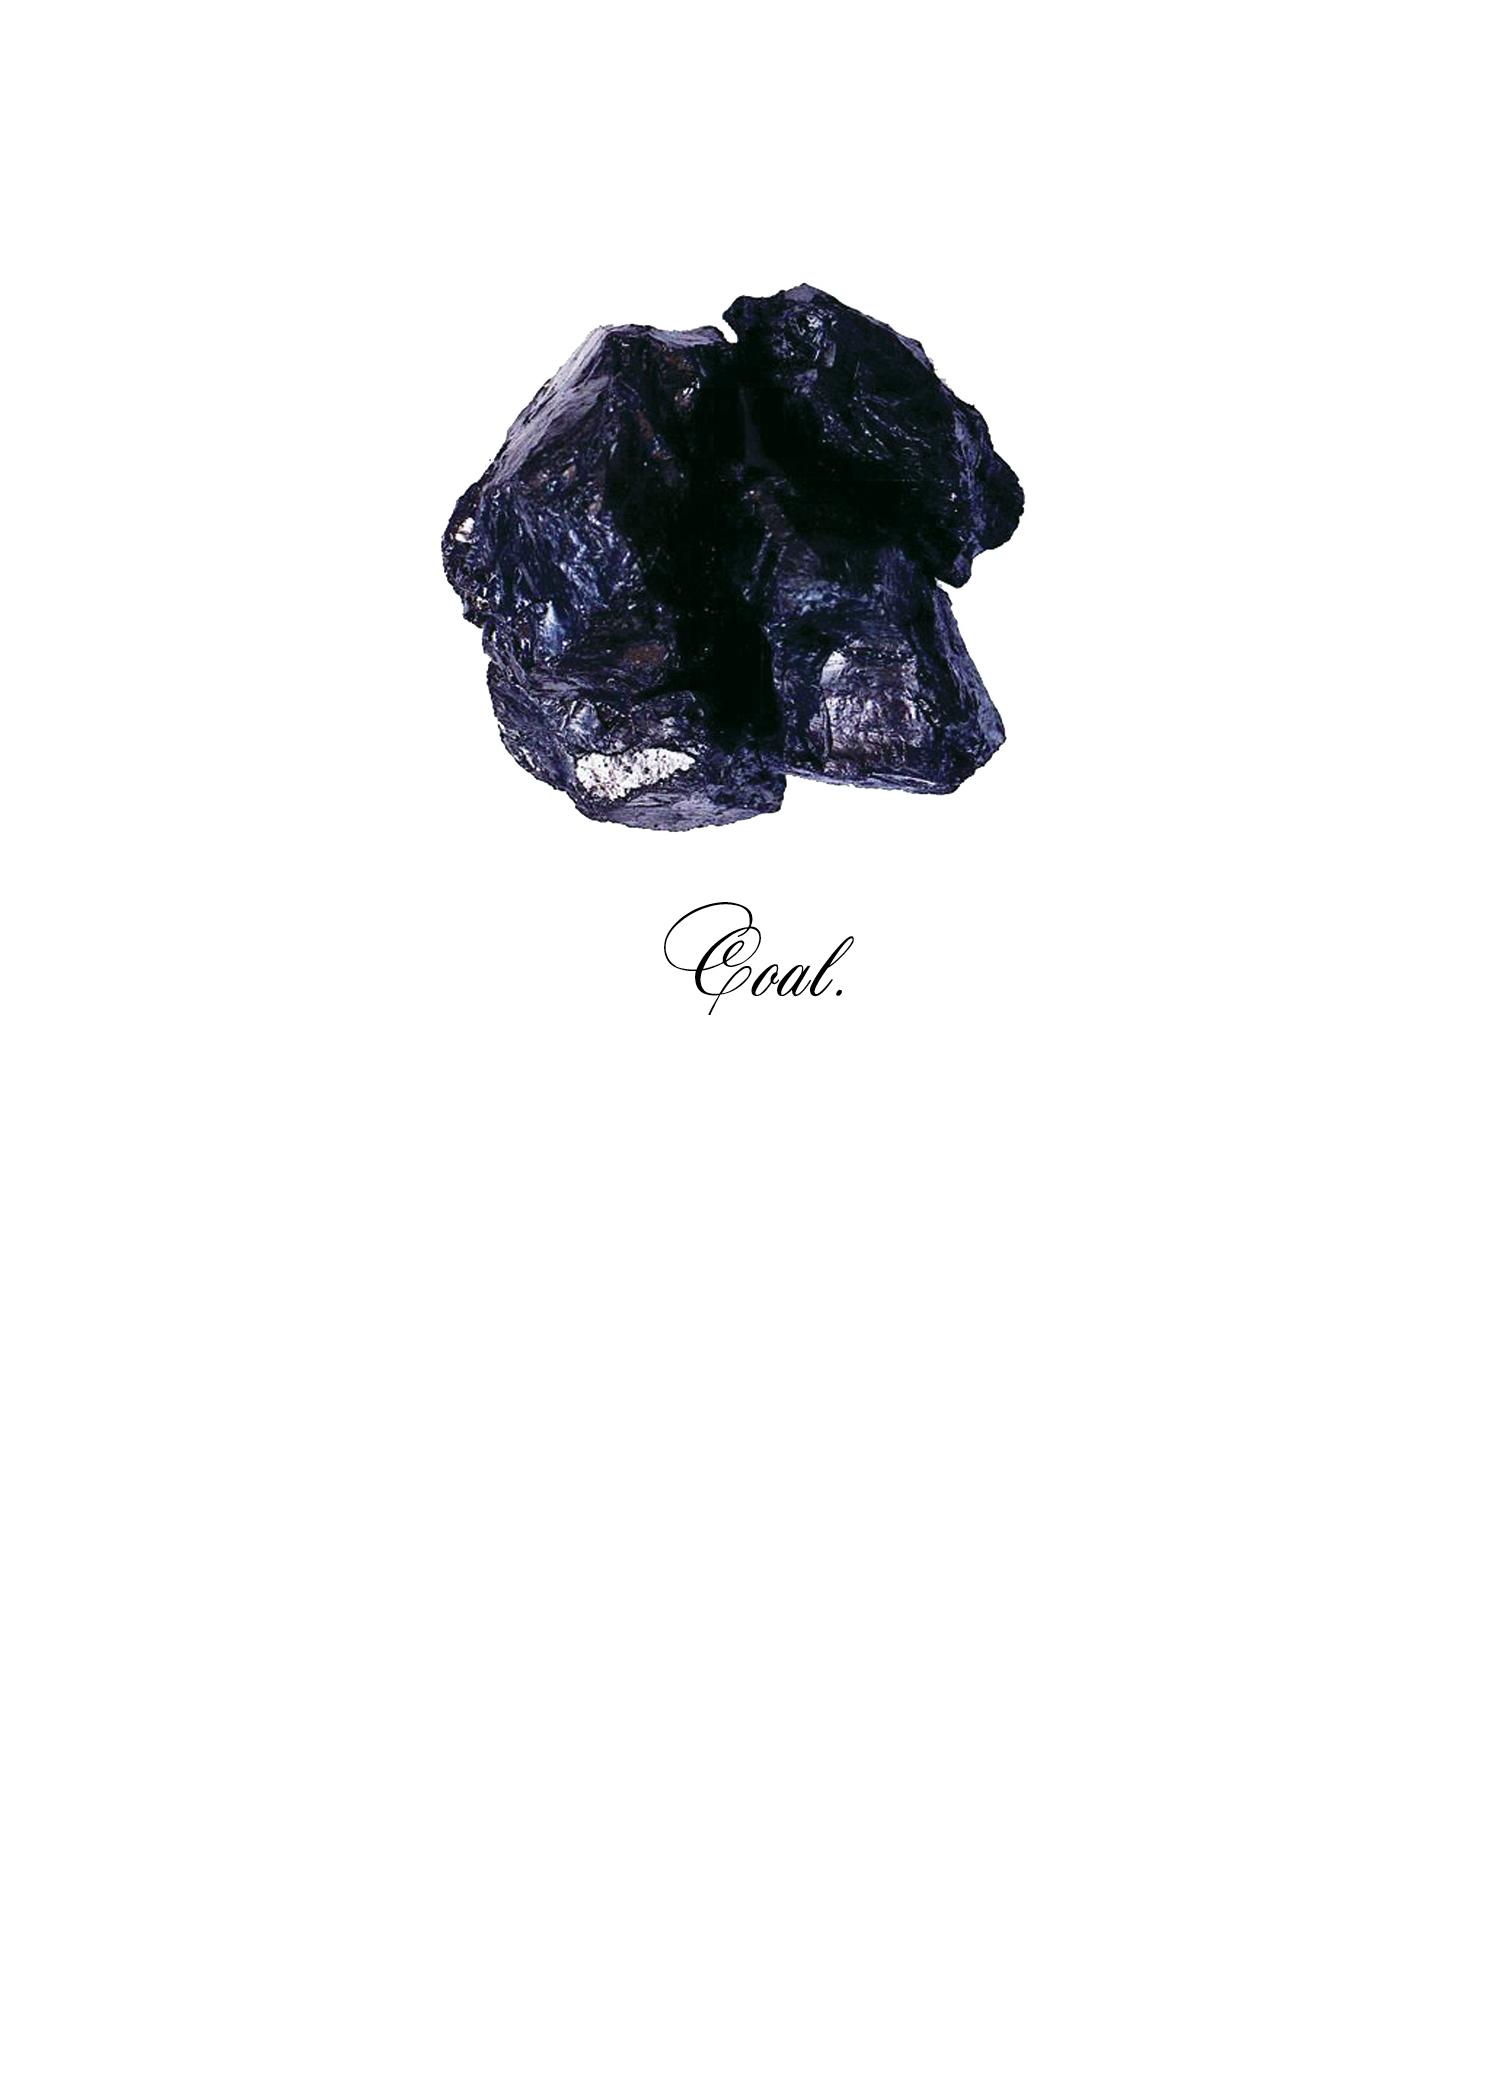 Modern Lump of Coal Christmas Card